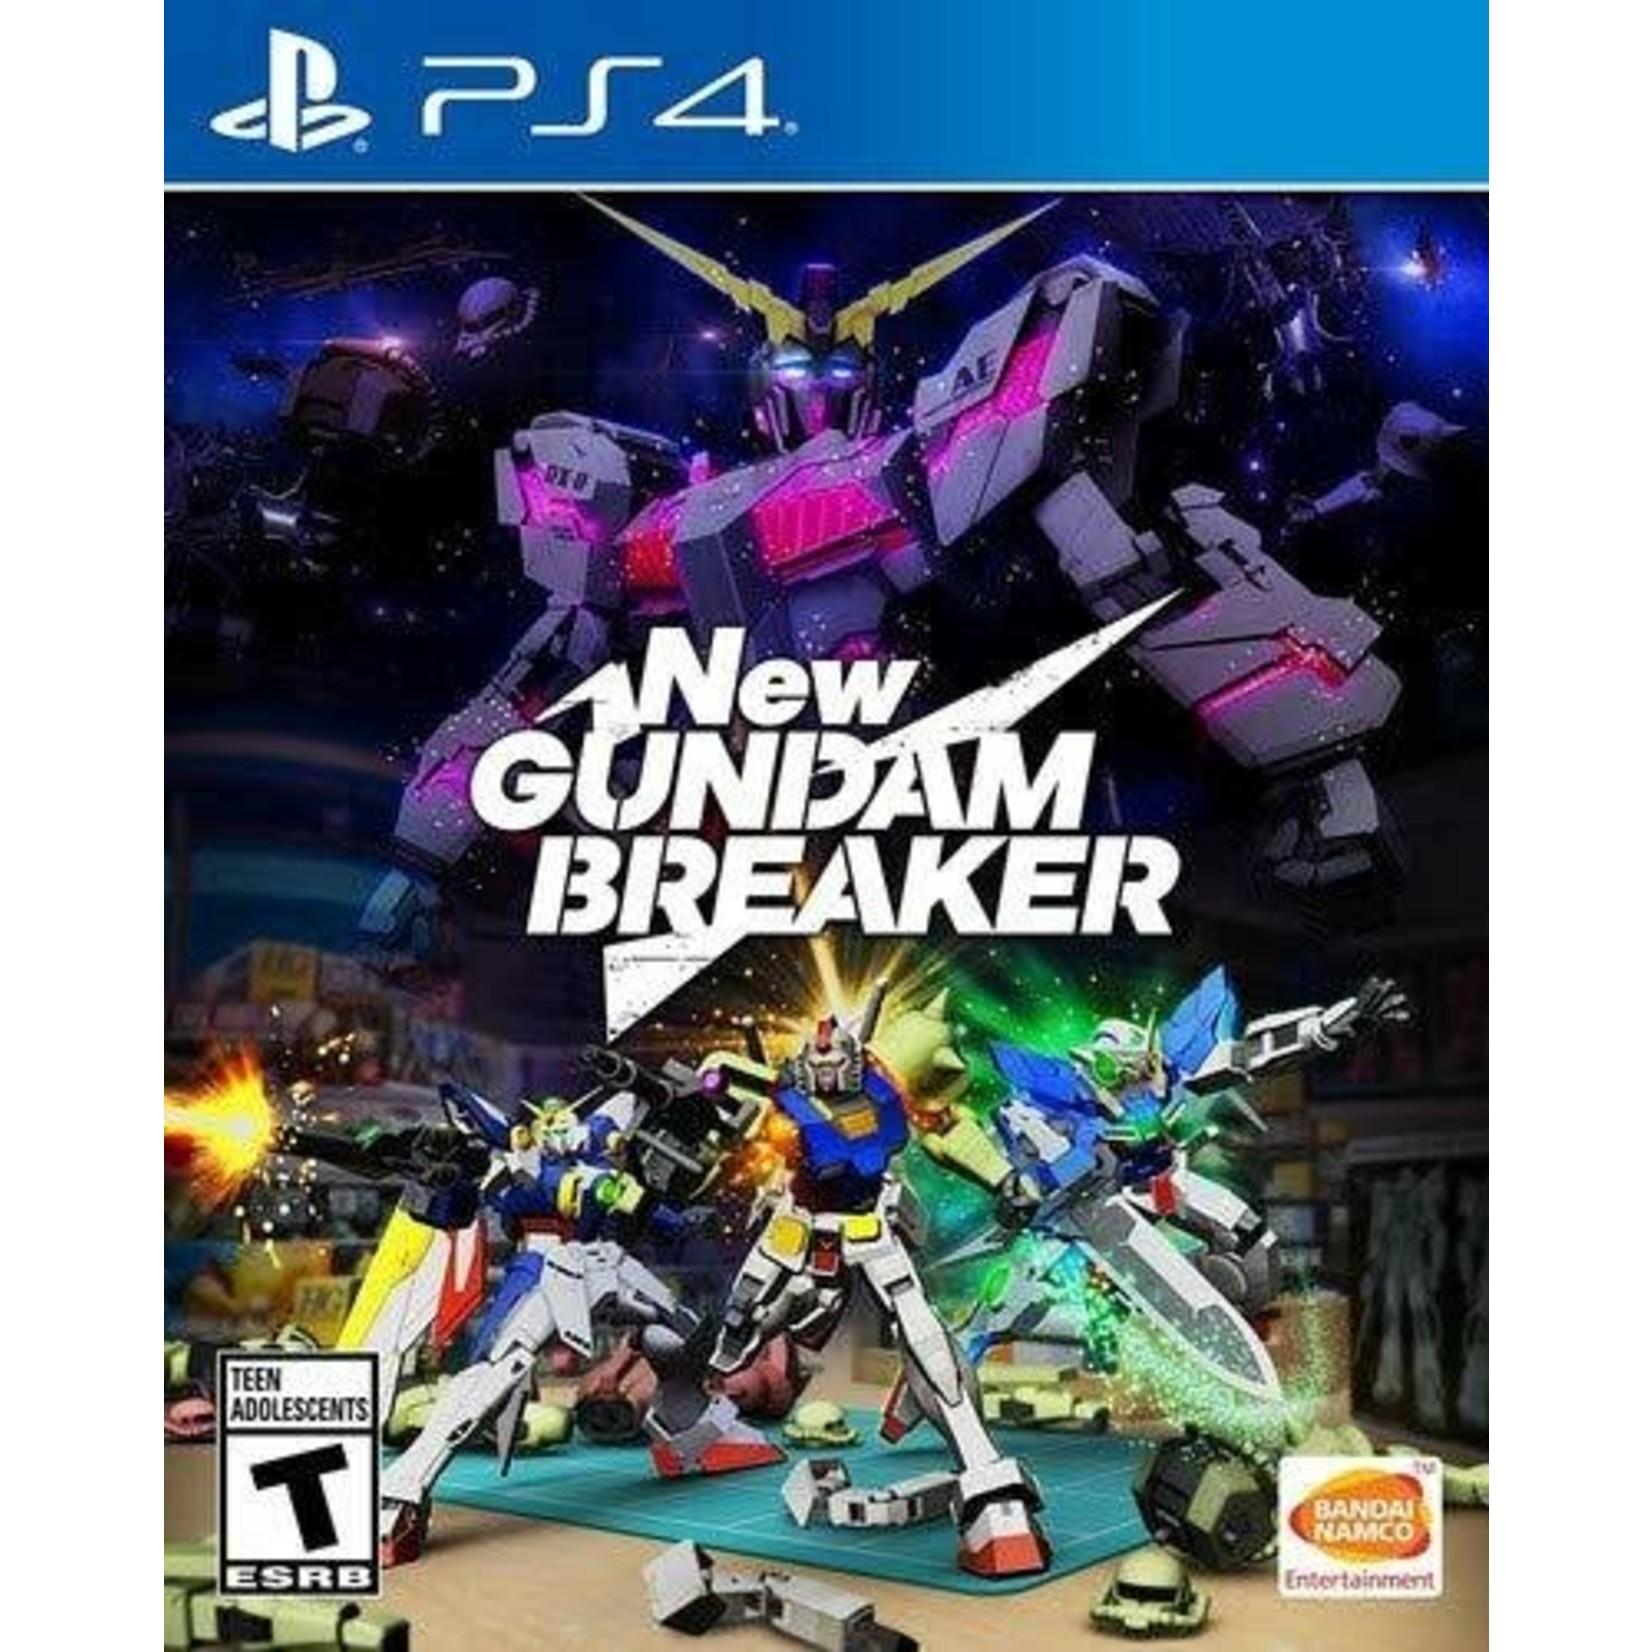 ps4-New Gundam Breaker